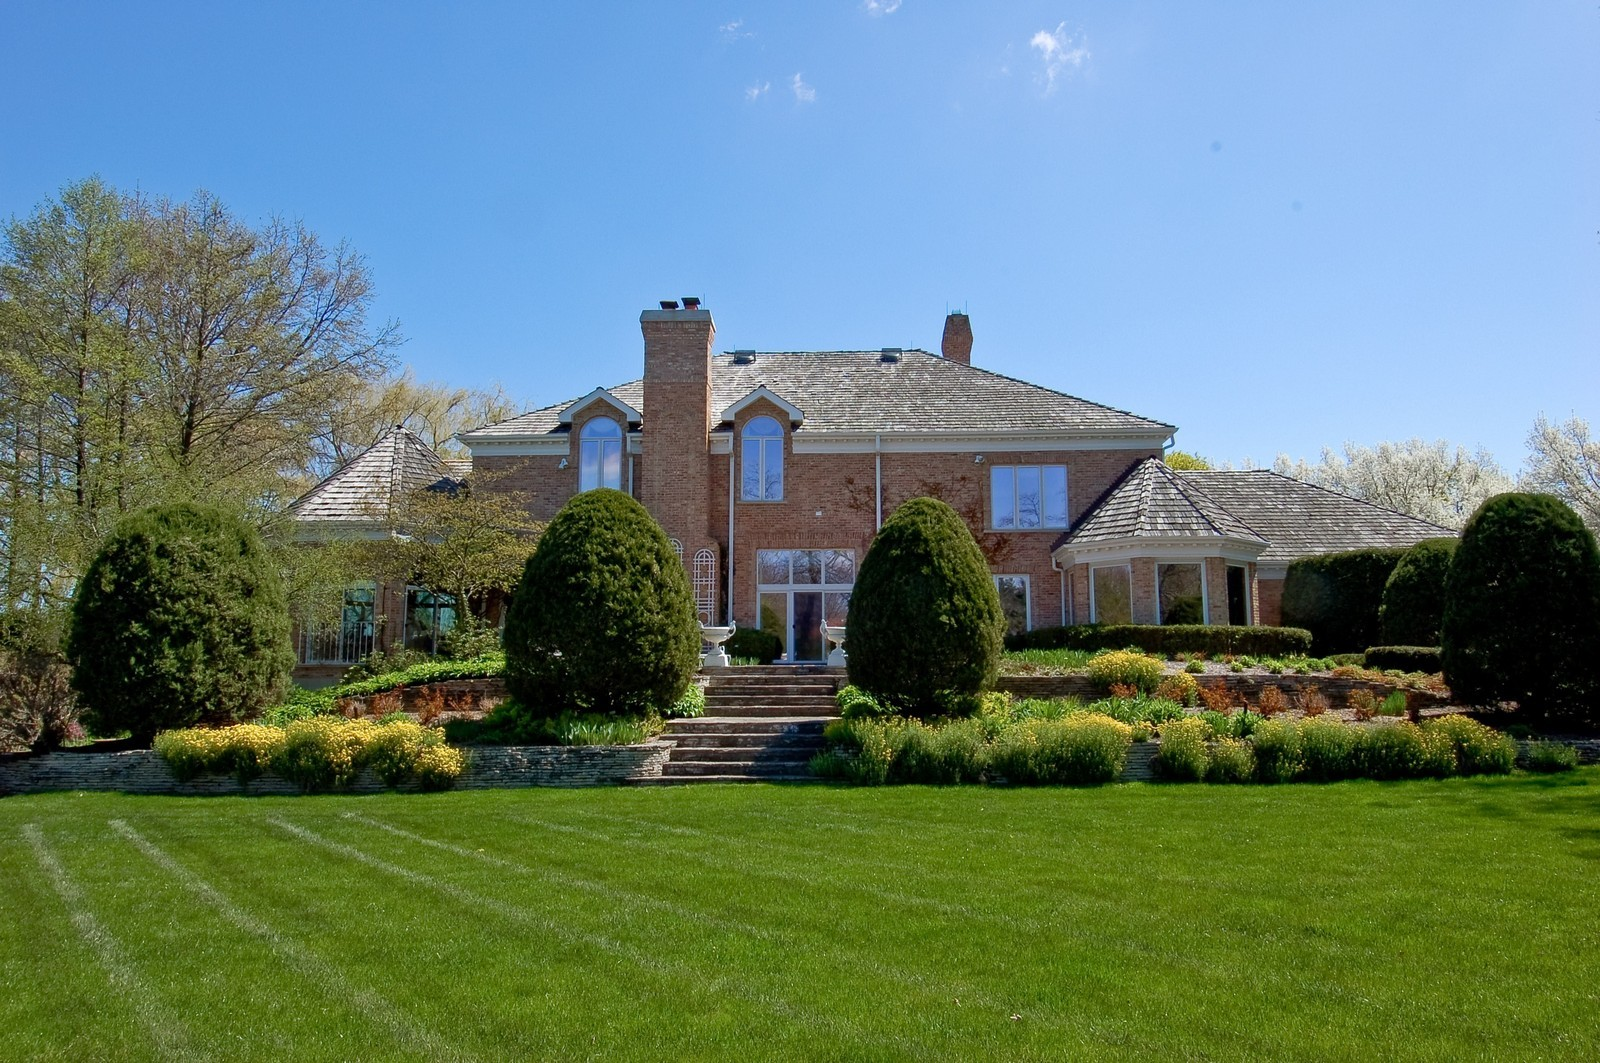 Real Estate Photography - 25471 W Plamondon, Wheaton, IL, 60189 - Location 2